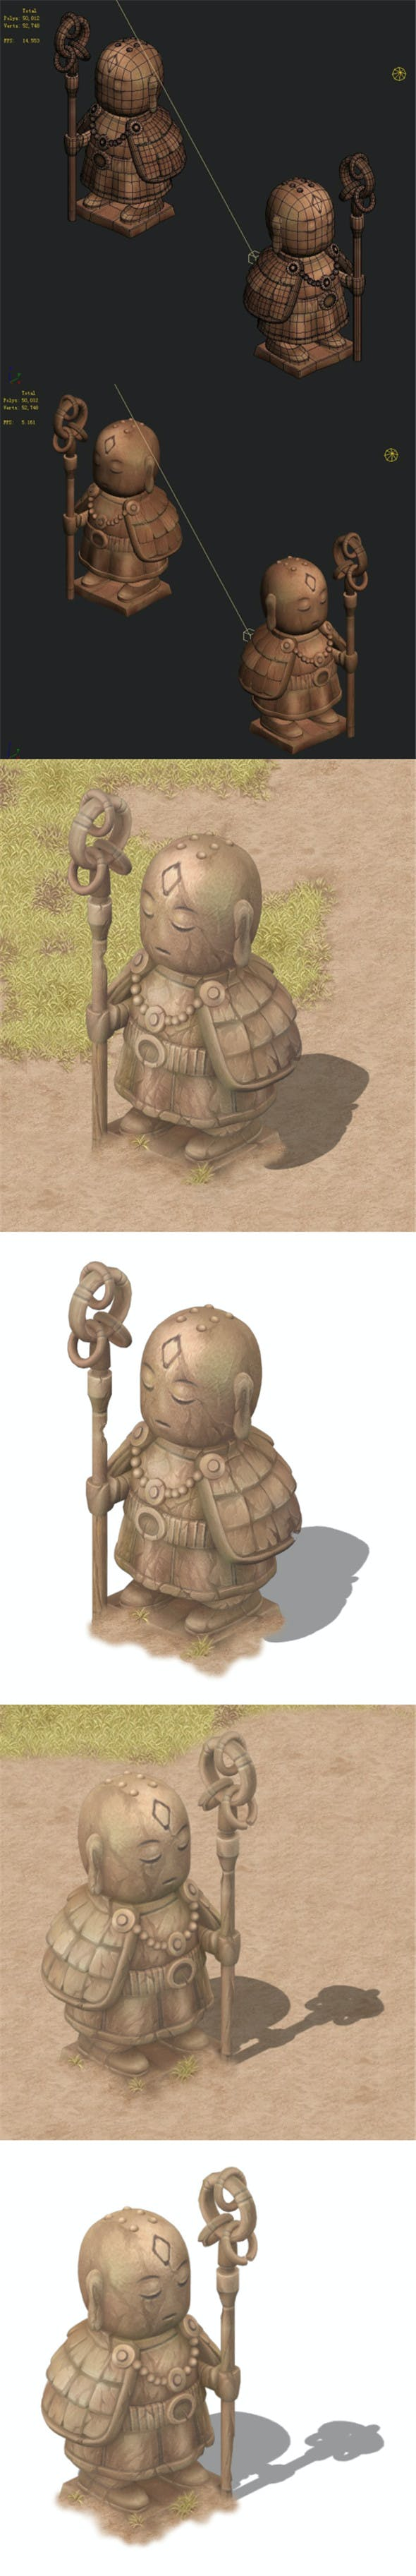 Cartoon version - ascetic monk statue 02 - 3DOcean Item for Sale